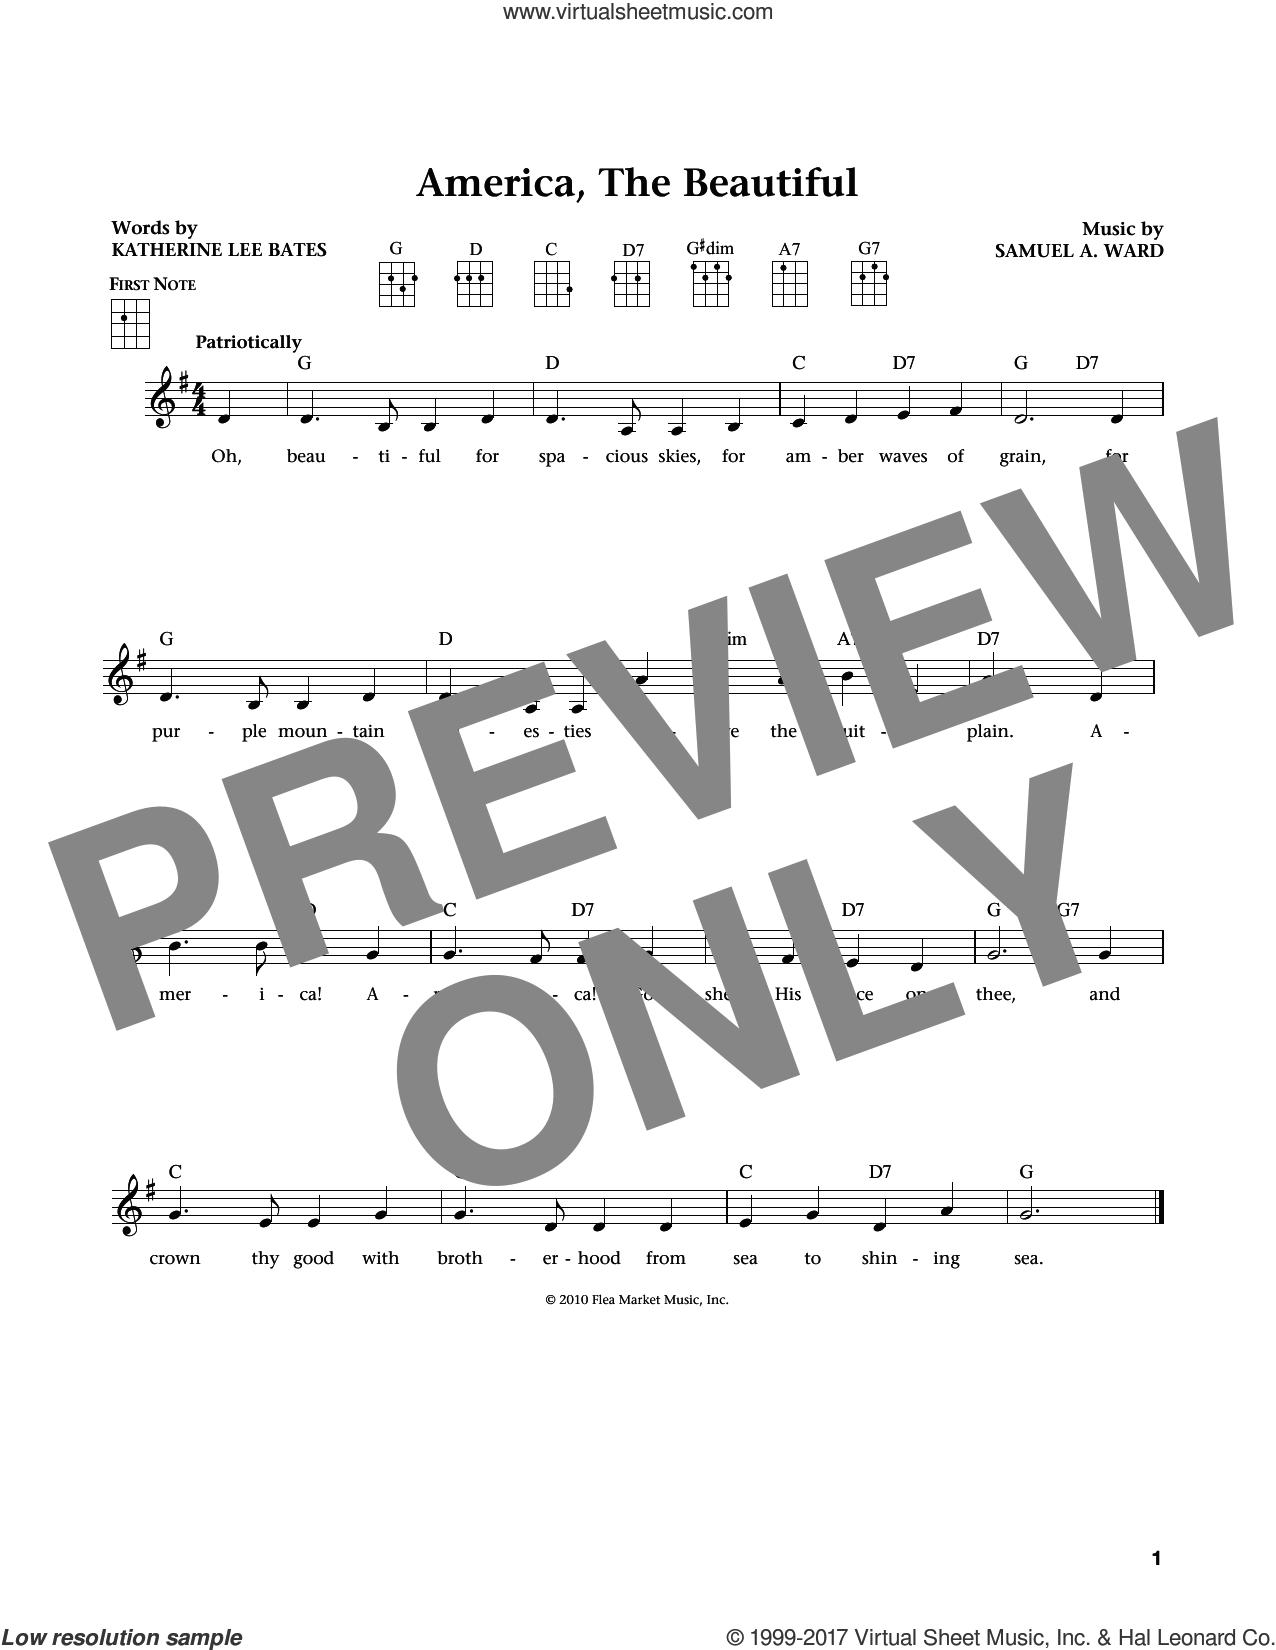 America, The Beautiful (from The Daily Ukulele) (arr. Liz and Jim Beloff) sheet music for ukulele by Katherine Lee Bates, Jim Beloff and Liz Beloff, intermediate skill level